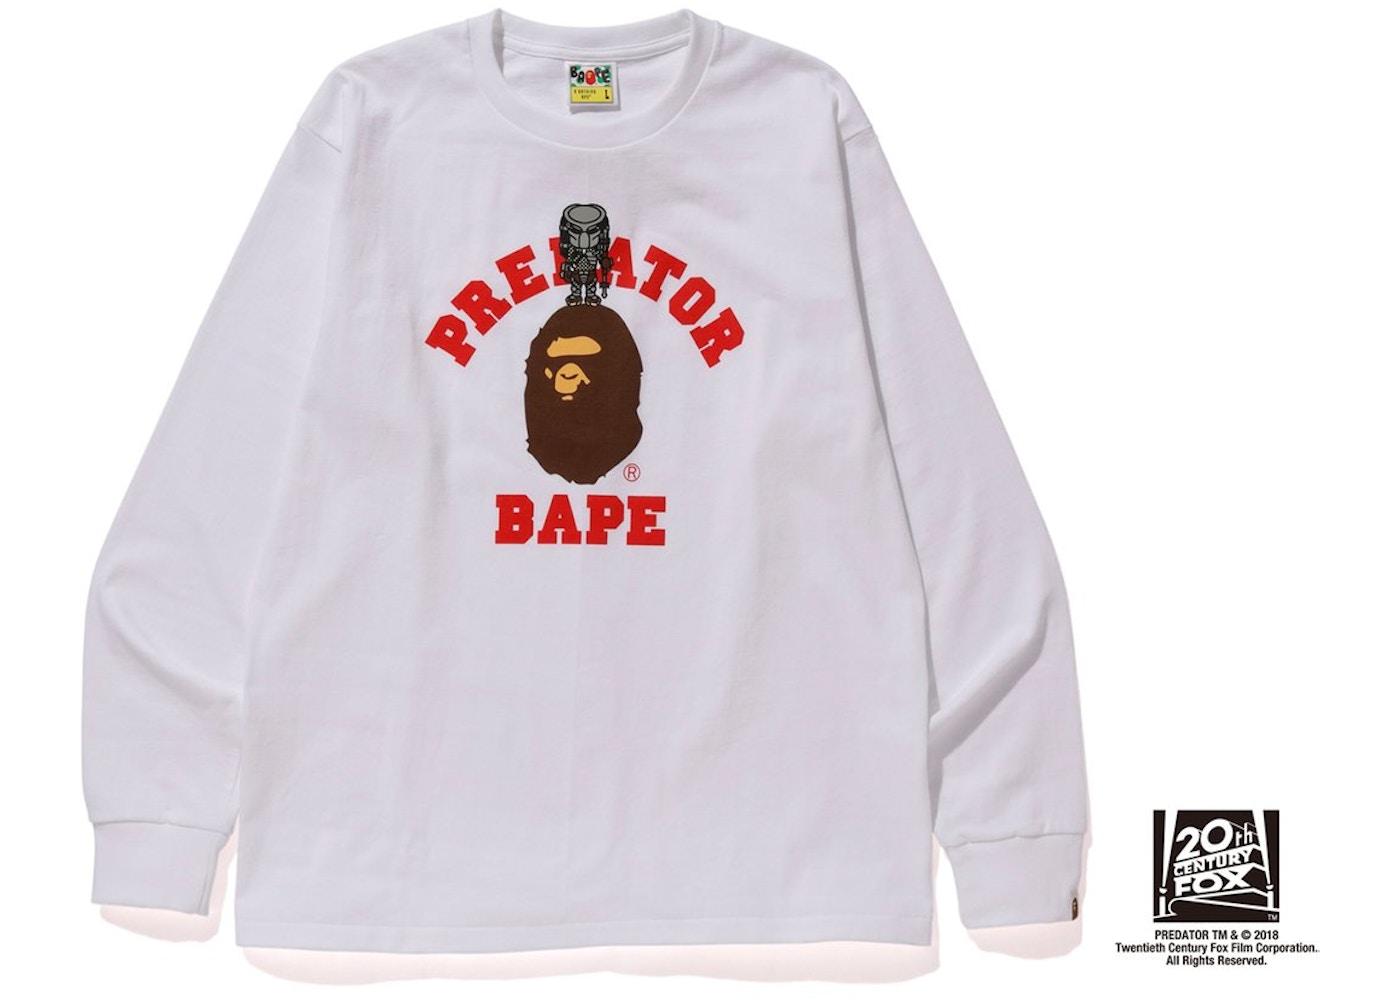 ba65a589 BAPE x Predator College Long Sleeve Tee White - FW18